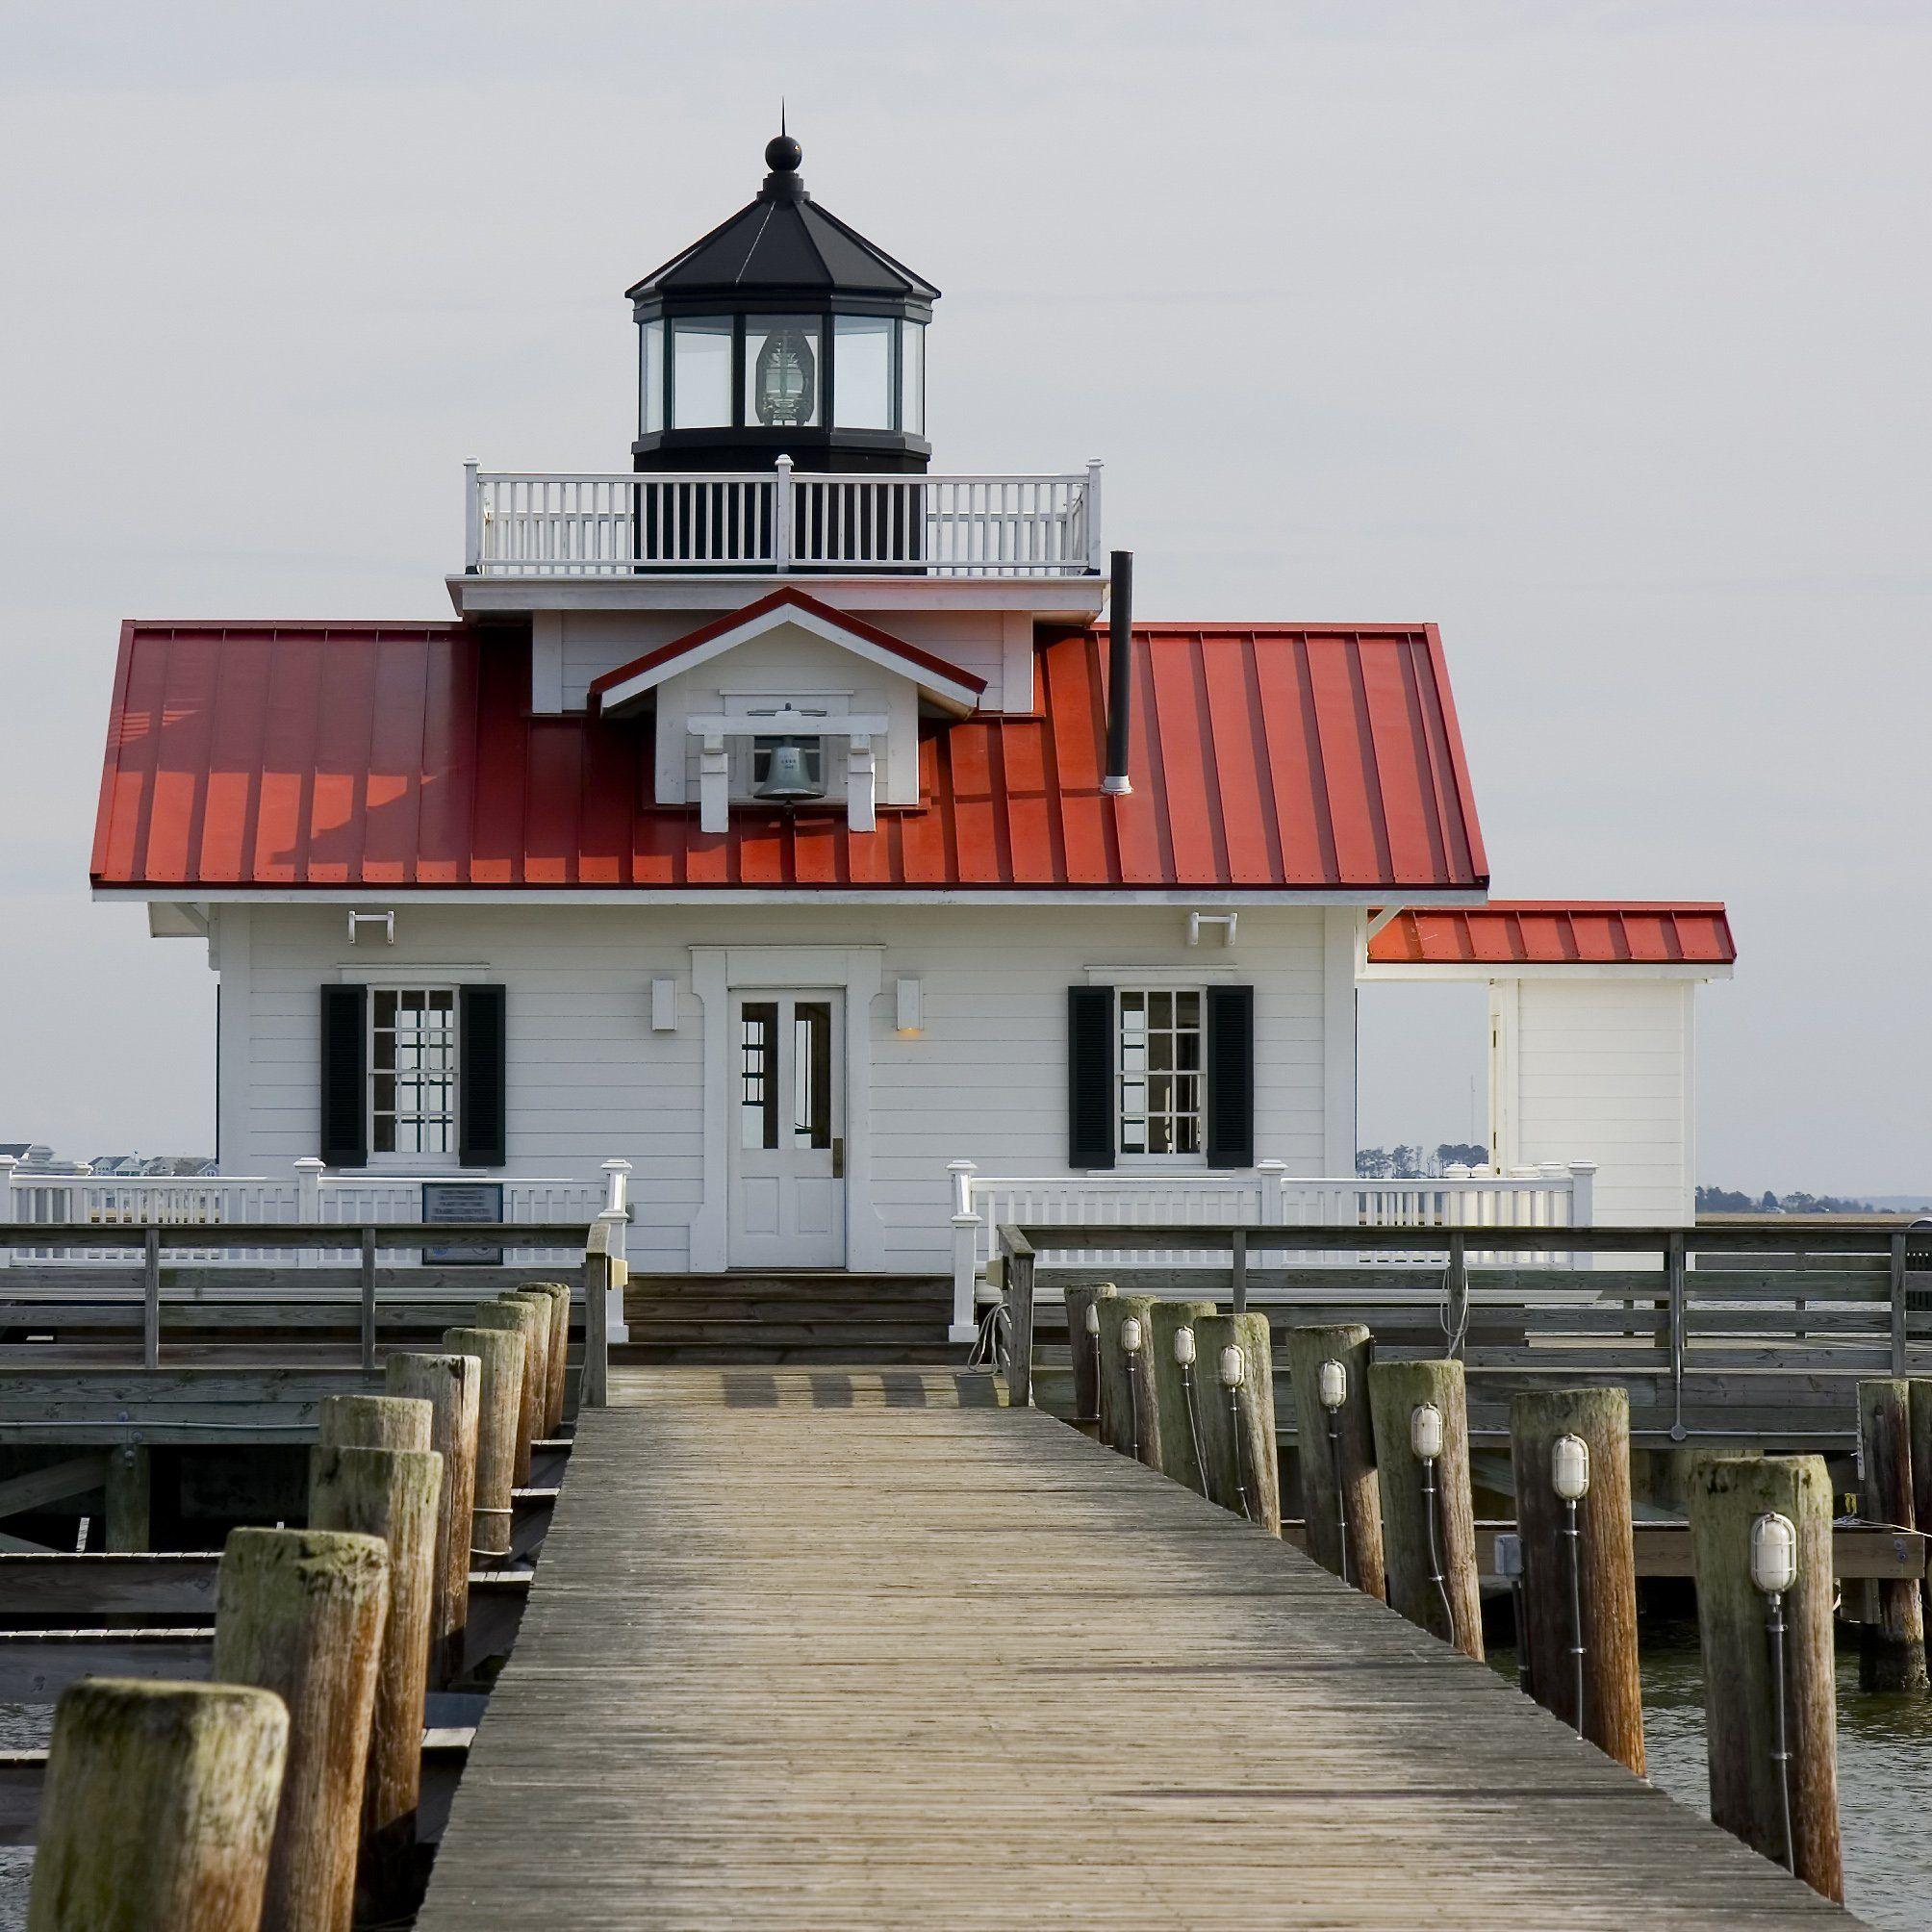 The Outer Banks Best Kept Secret 9 Things To Do In Manteo North Carolina Roanoke Island Manteo North Carolina Aquarium